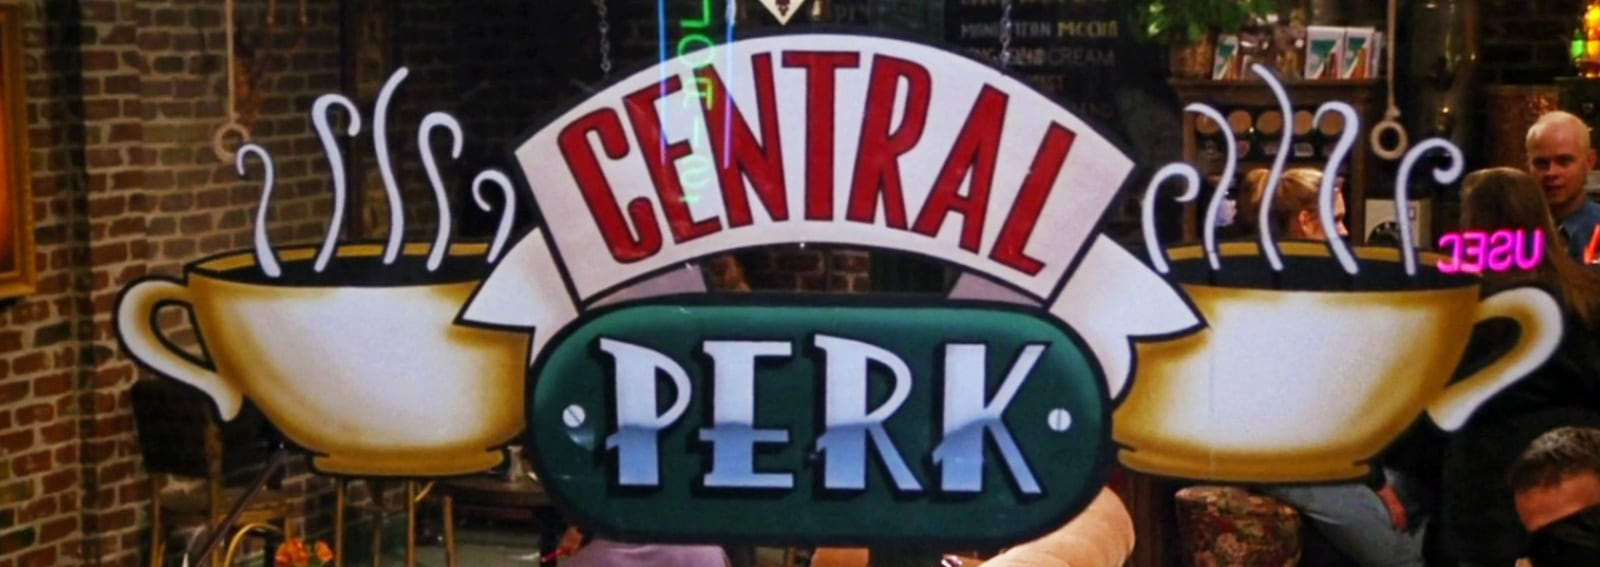 cover apre vero central perk friends desktop